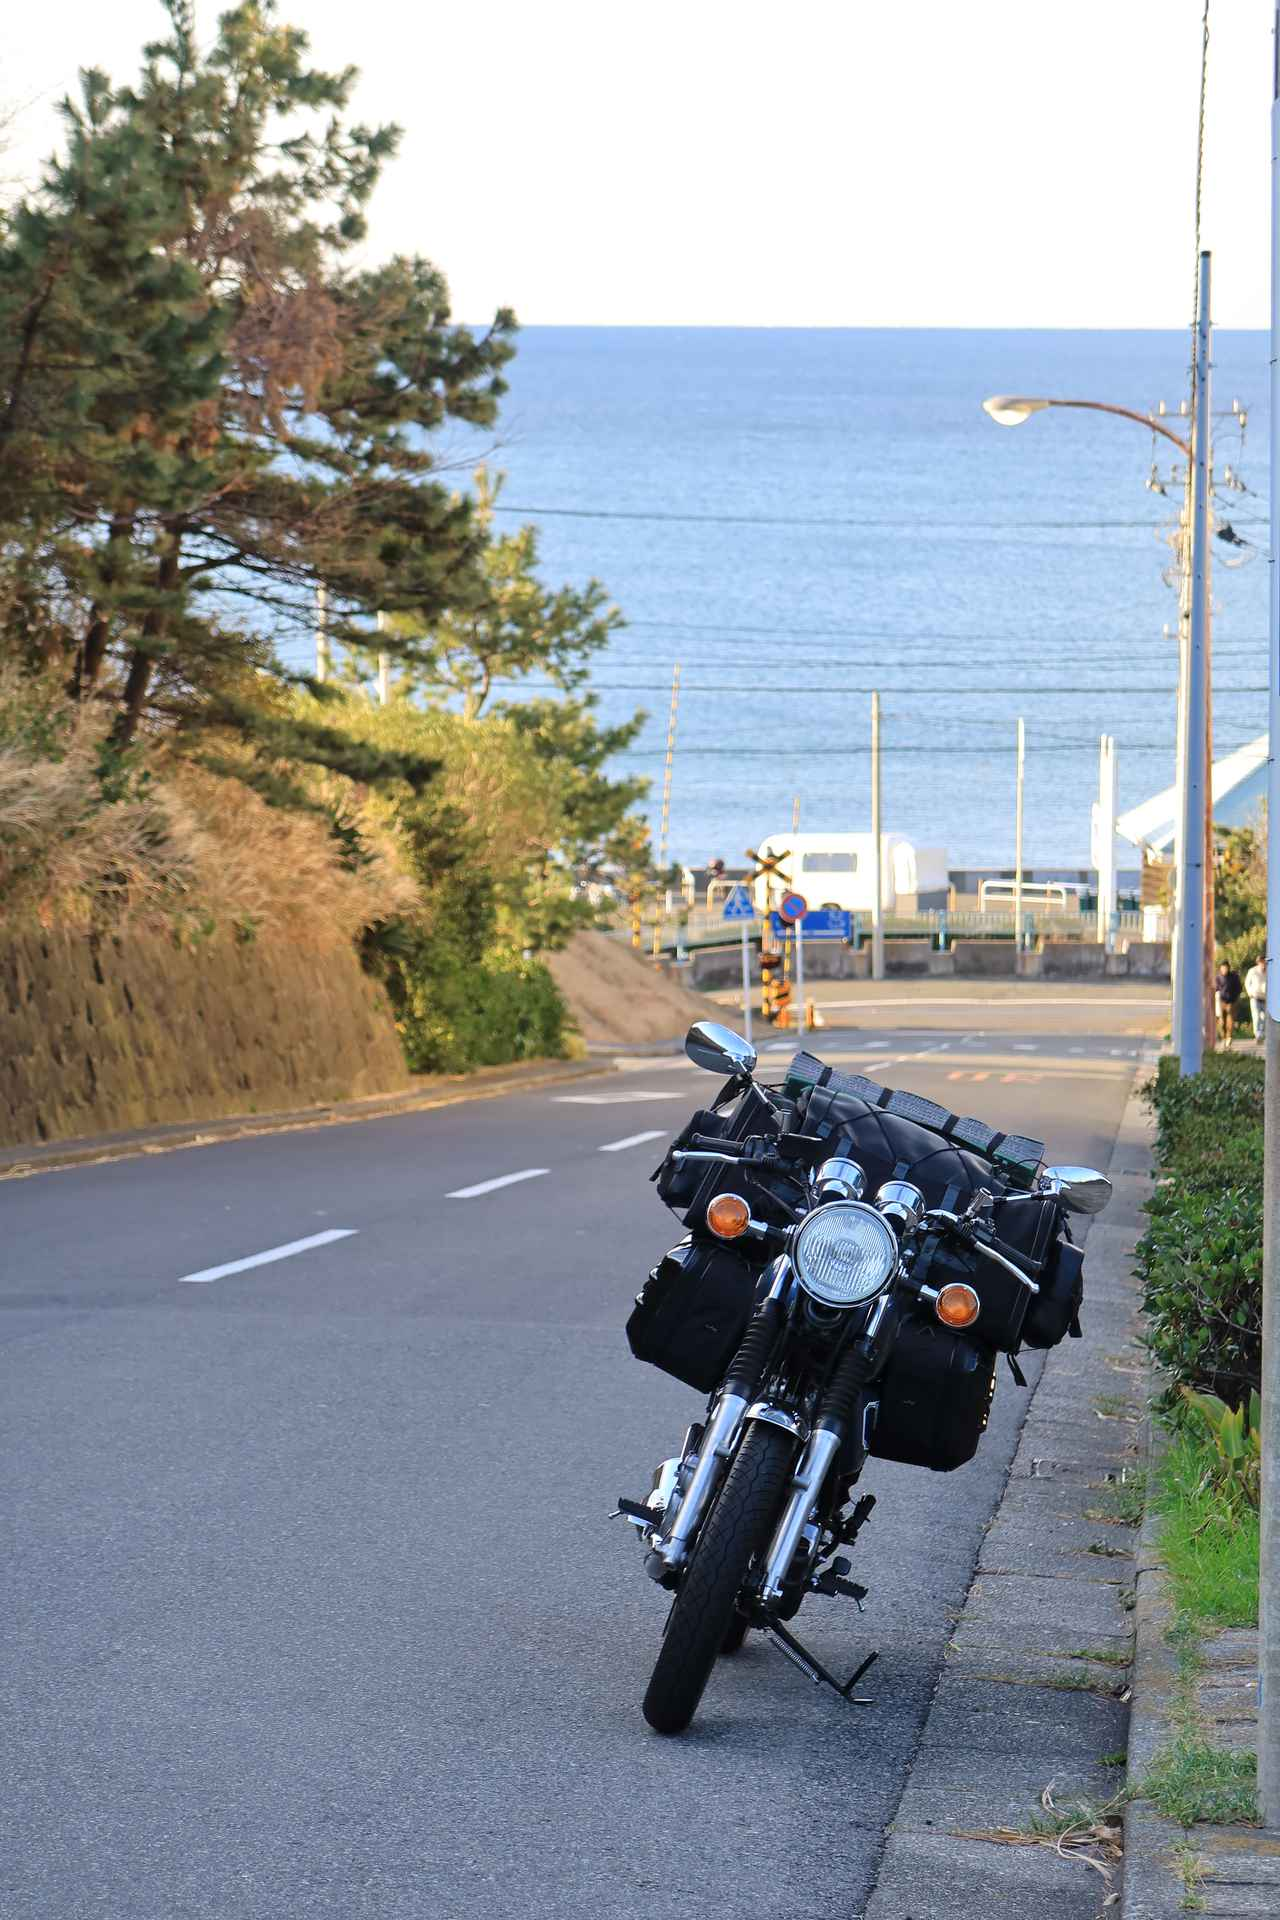 Images : 1番目の画像 - SR400 ツーリング風景写真 - webオートバイ